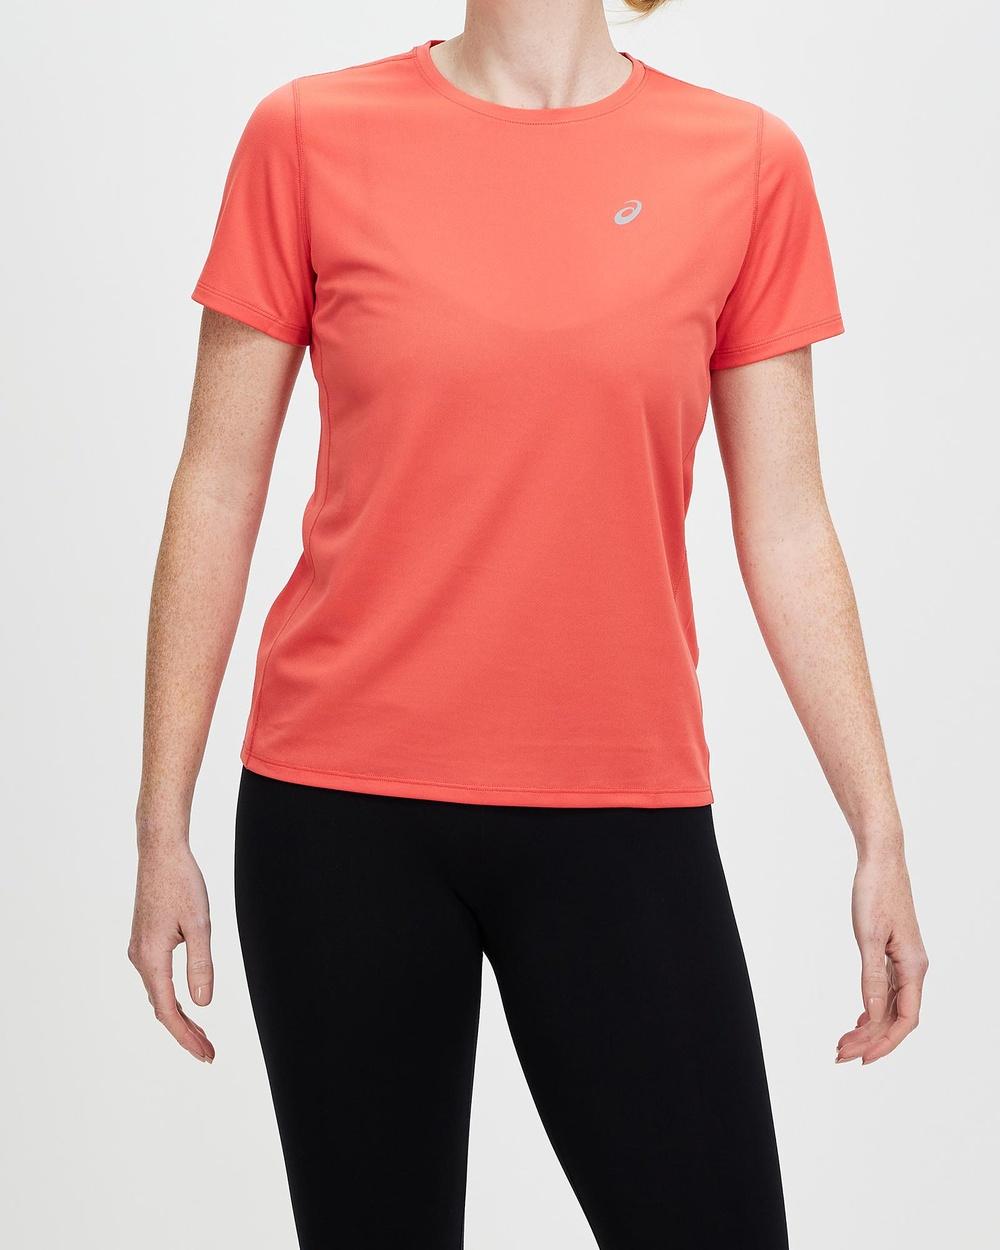 ASICS Katakana Short Sleeved Top Women's Sleeve T-Shirts Pink Grapefruit